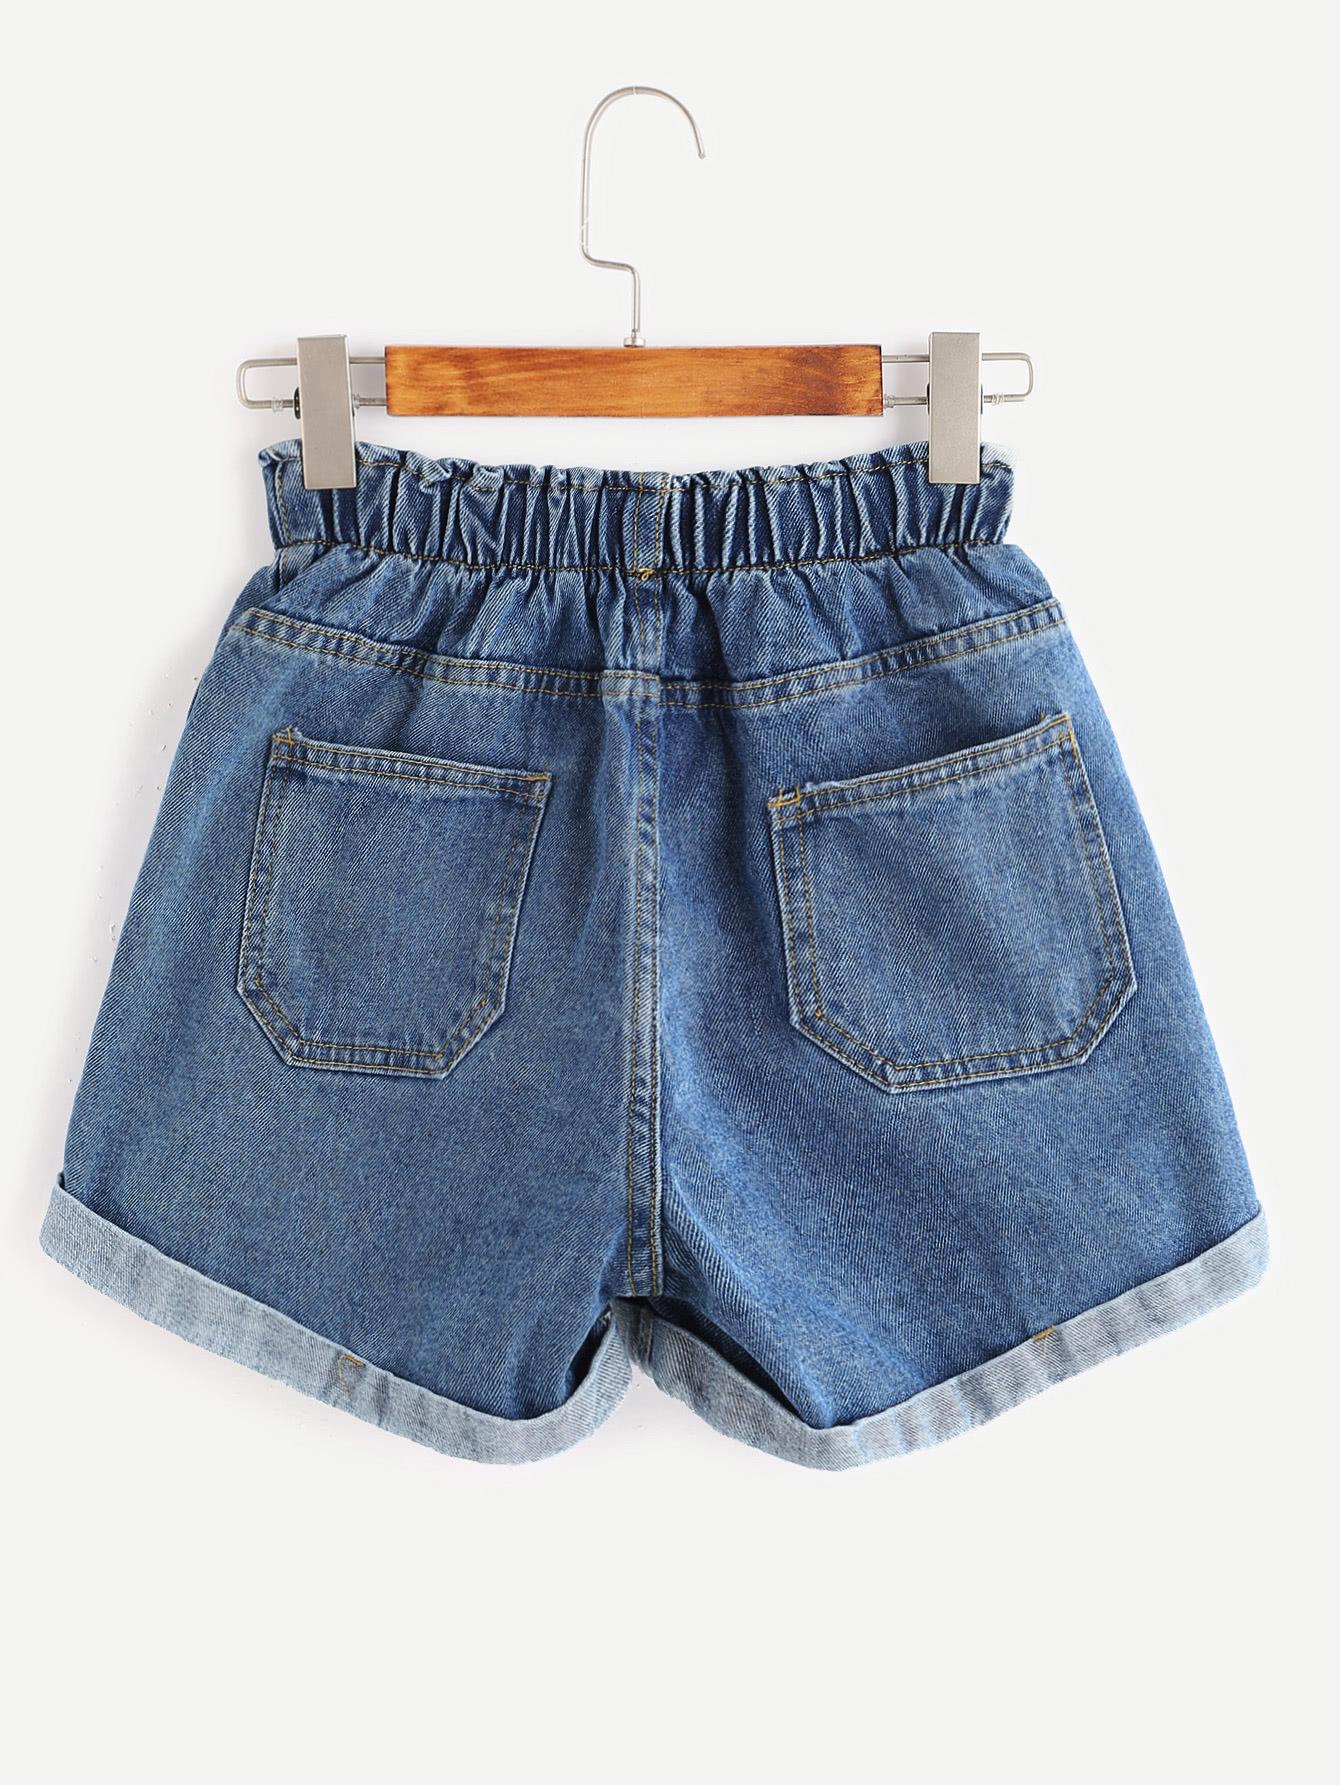 3cf8c0d3d9 Blue Elastic Waist Rolled Hem Denim Shorts   ROMWE